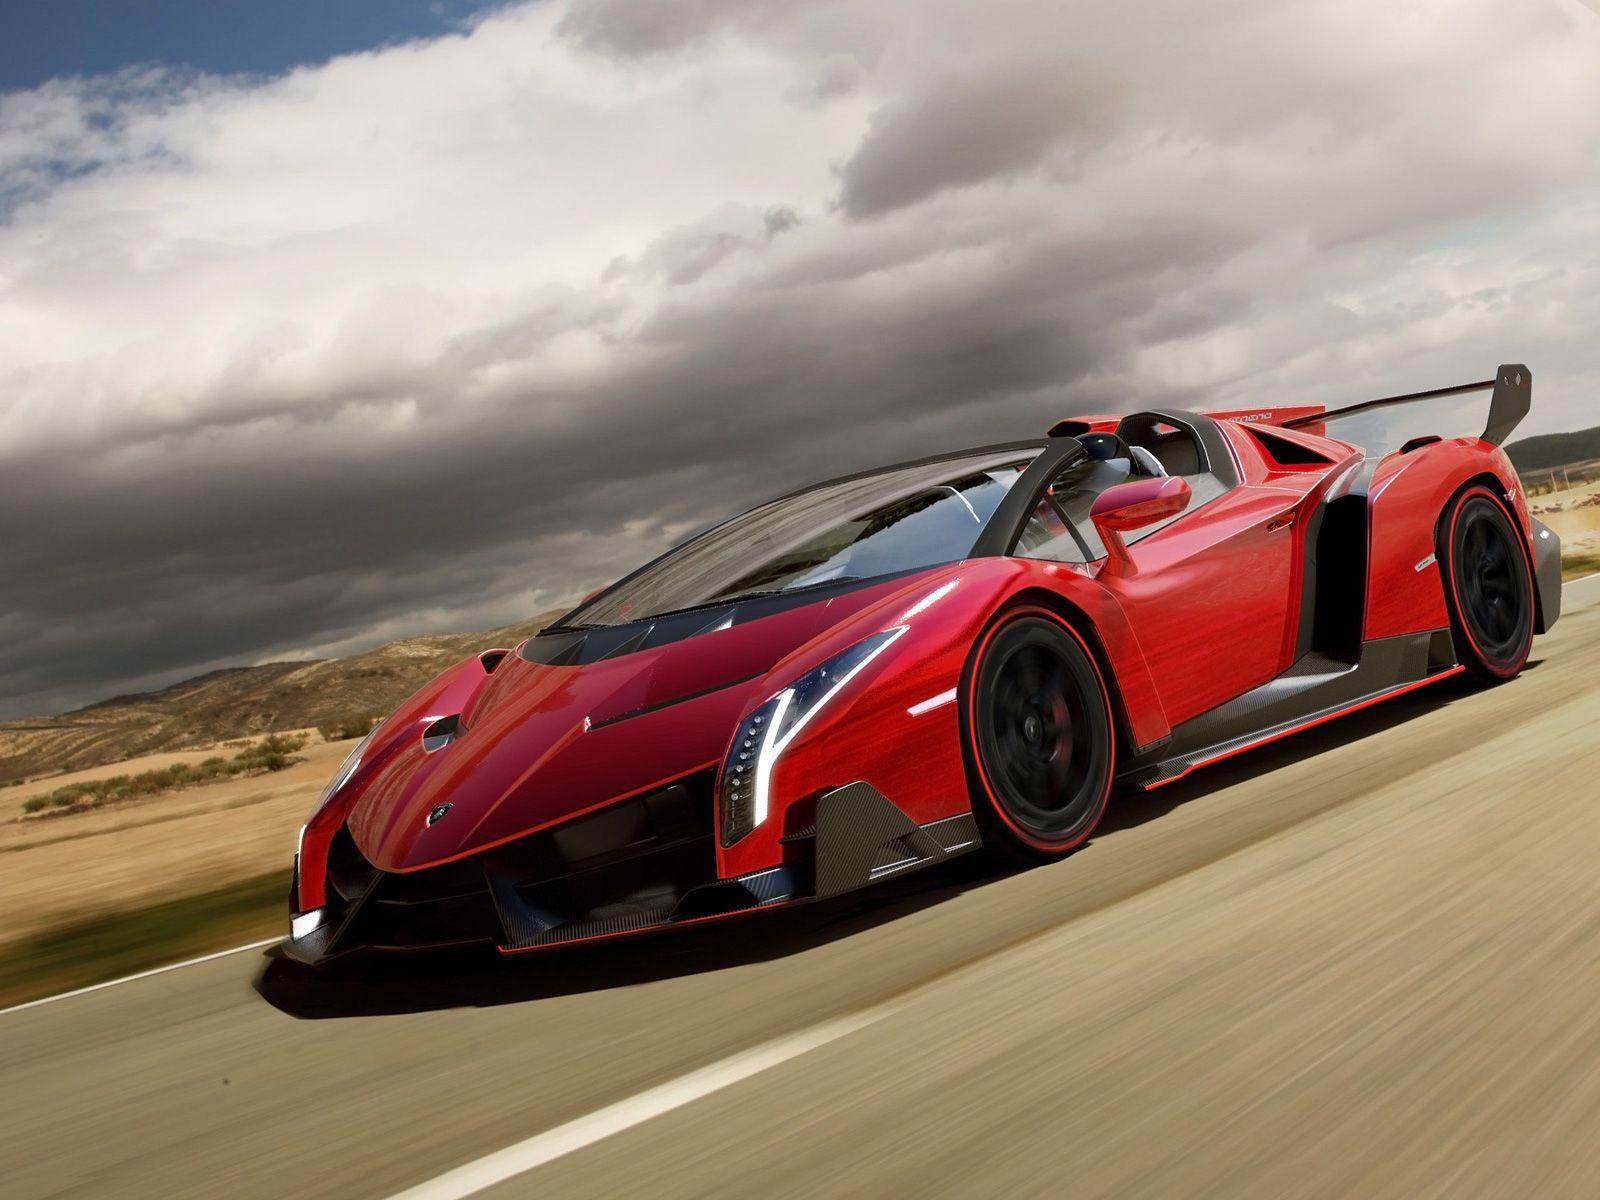 Destin Auto Rentals Is The Premier Destin Car Rental Agency On